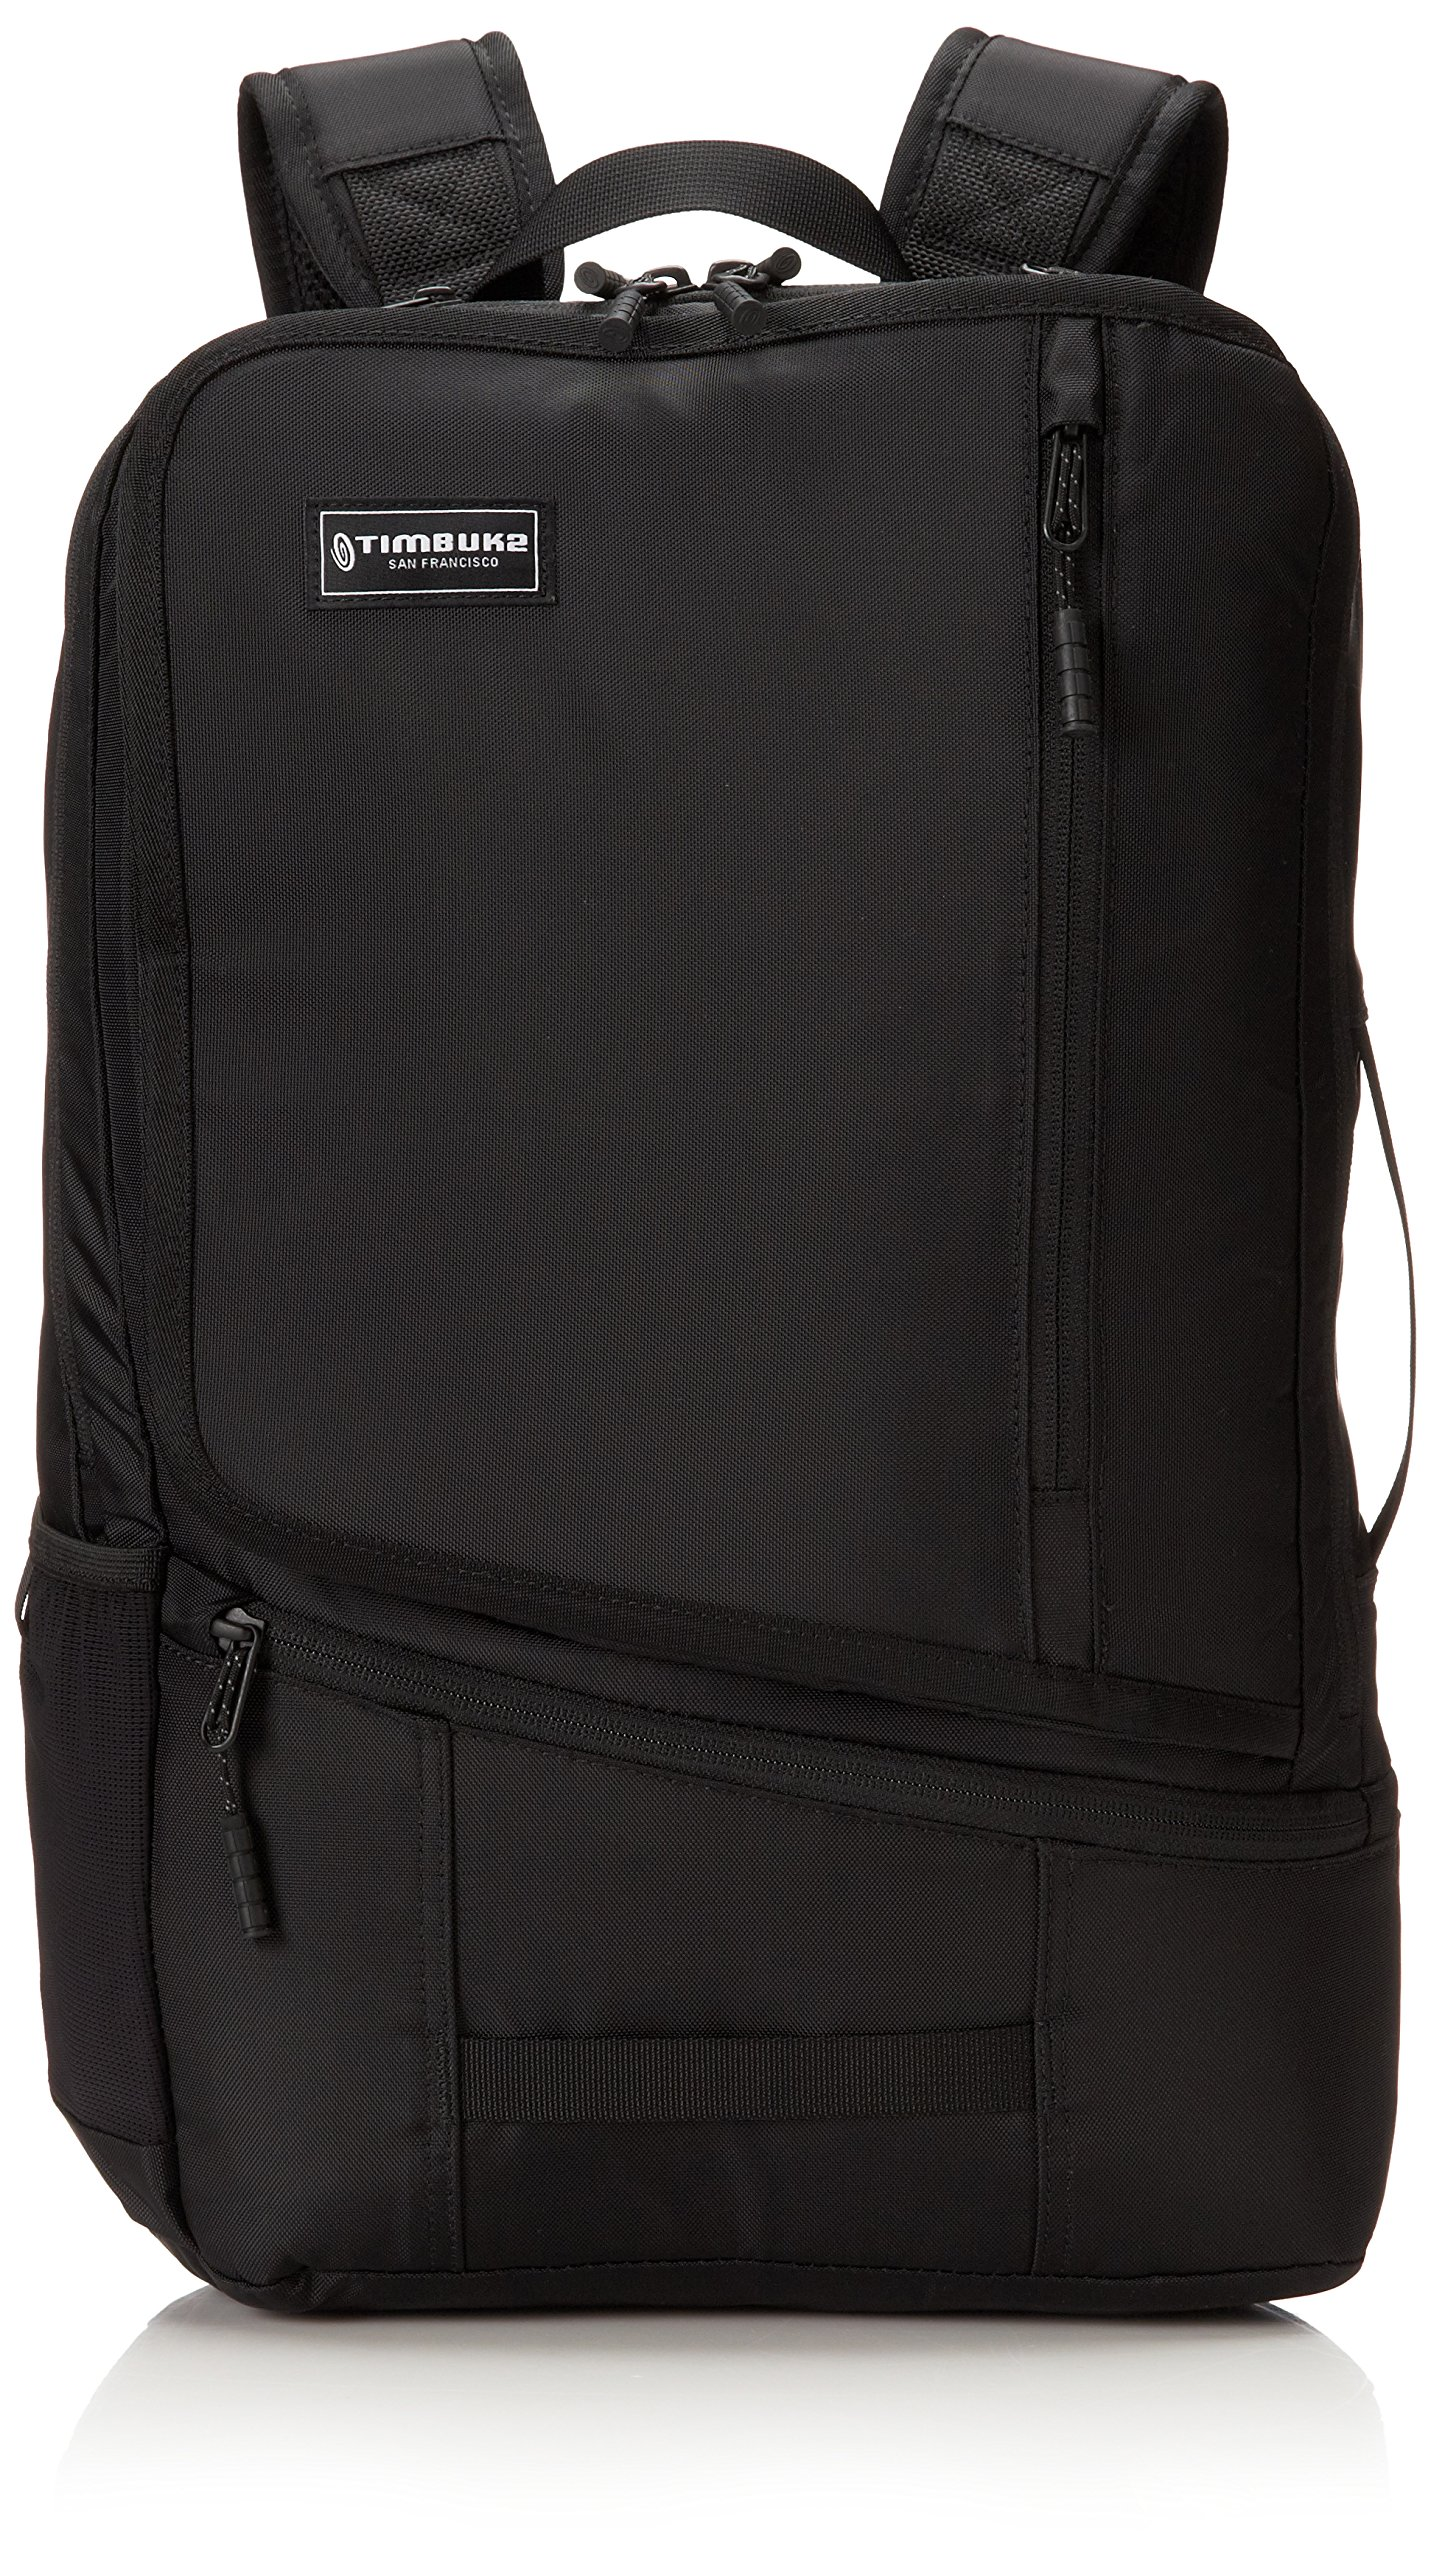 Timuk2 Q Laptop Backpack, OS, Black